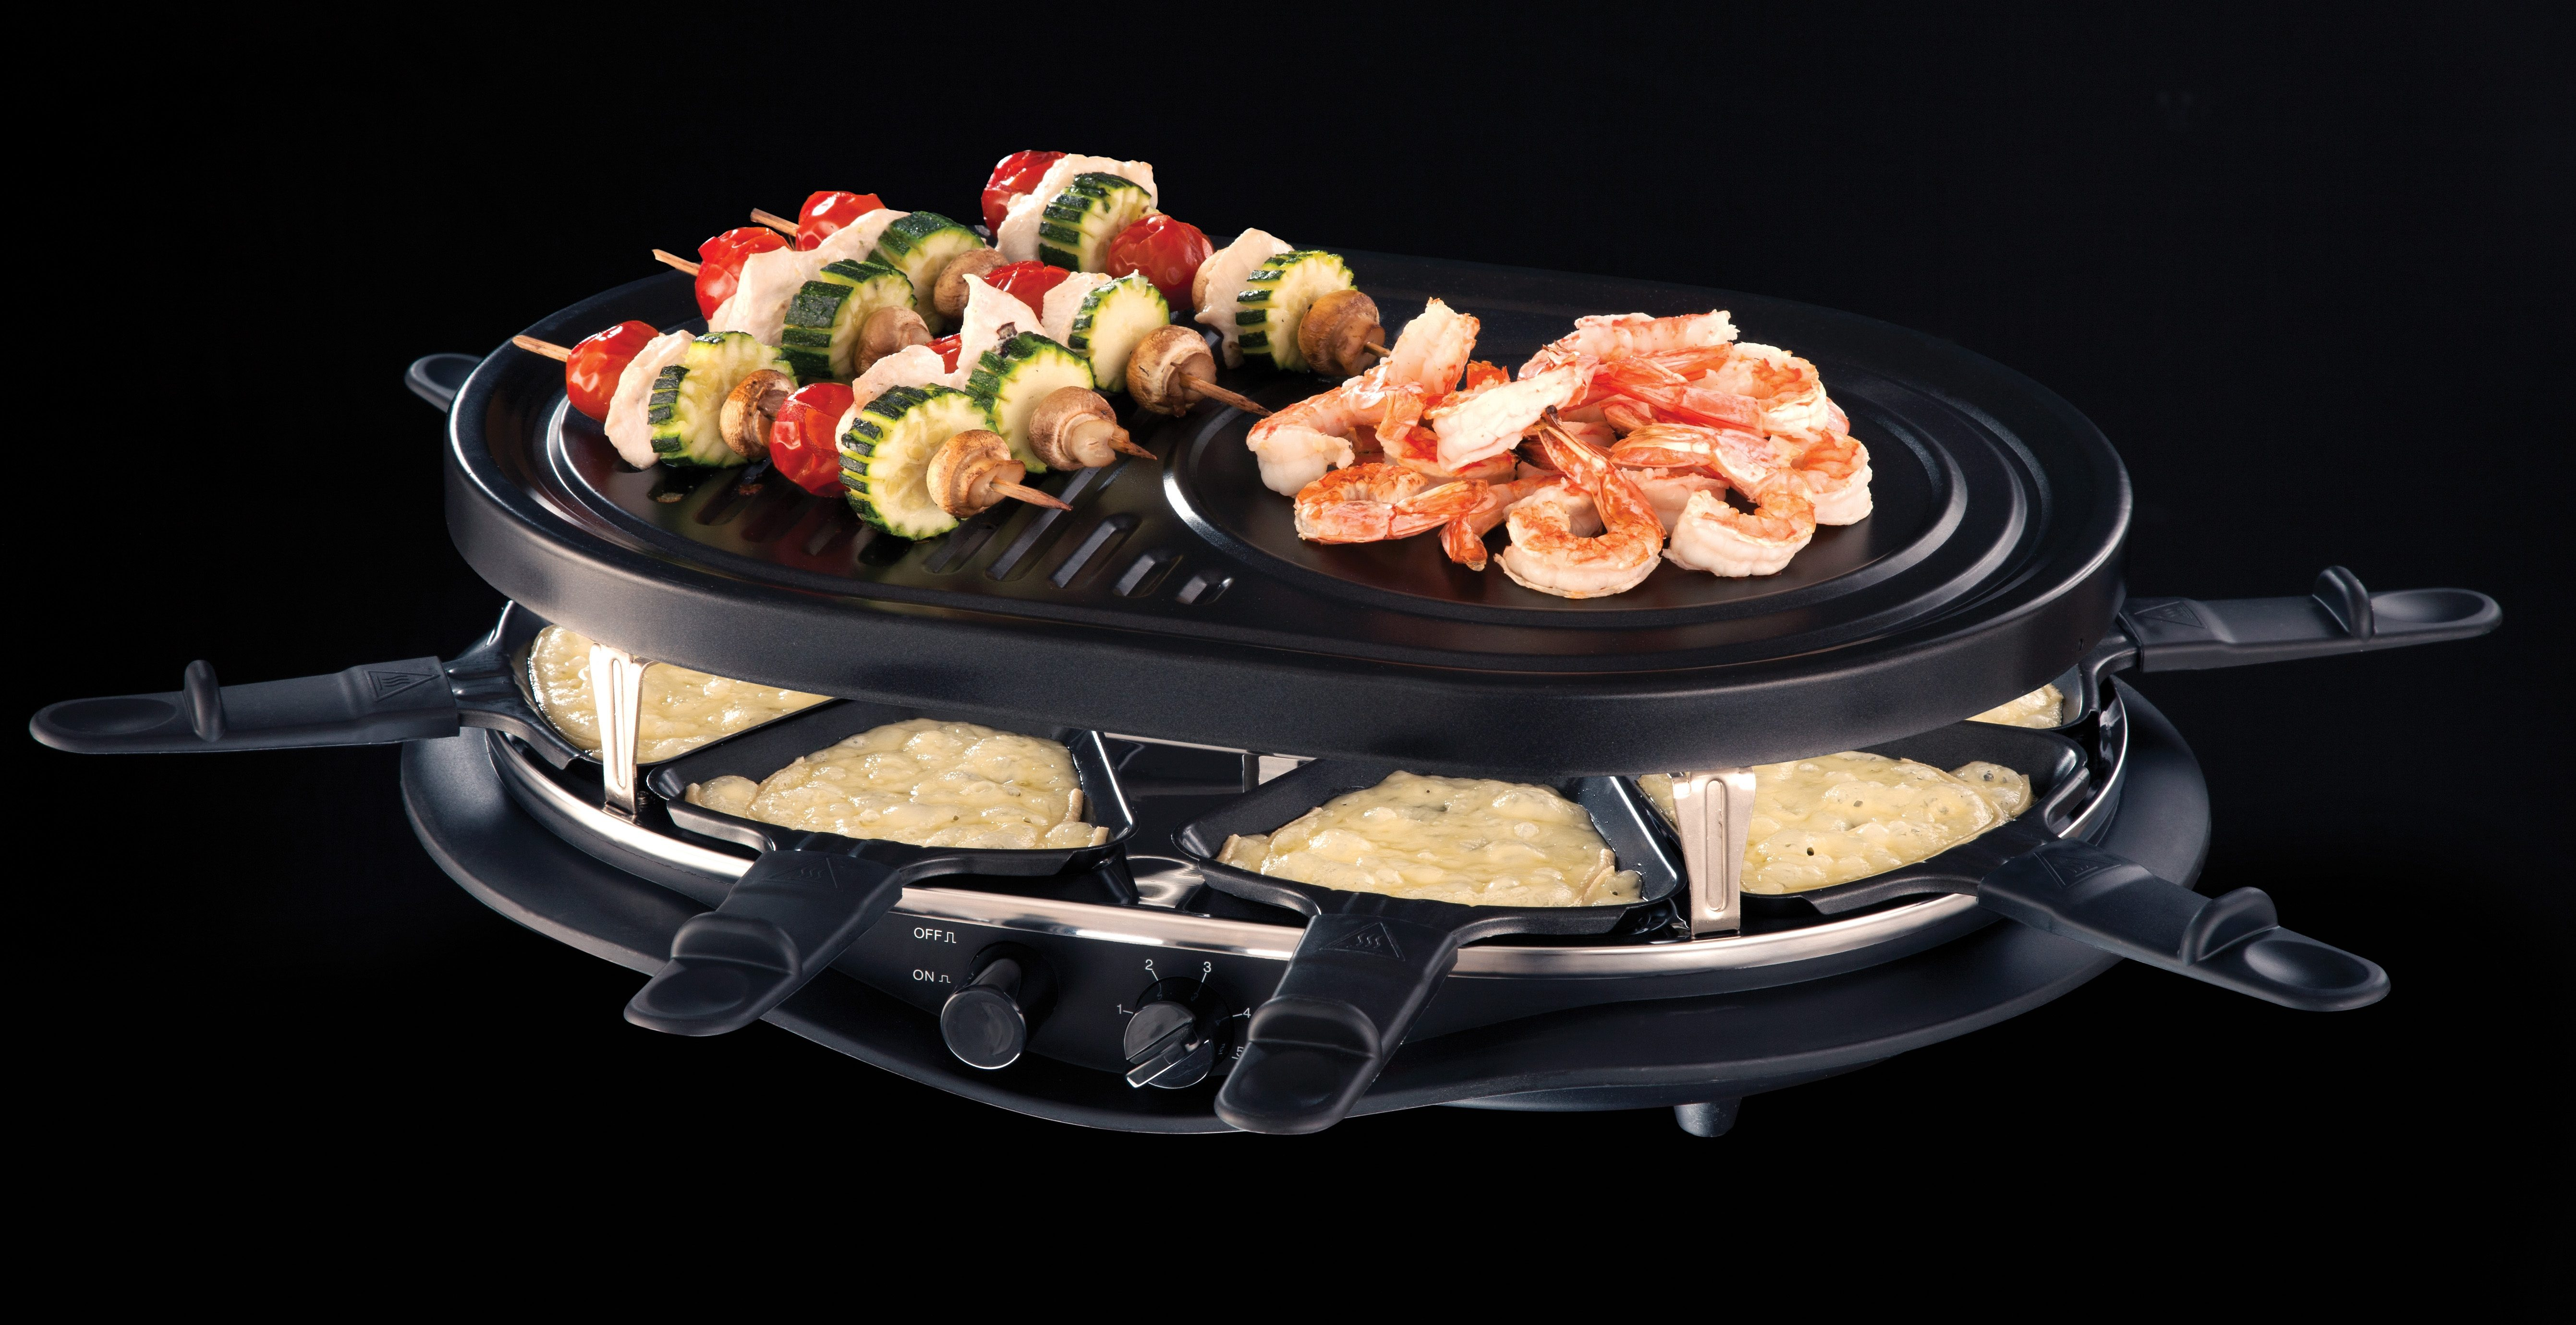 Russell Hobbs Multi-Raclette Fiesta 21000-56, 3 verschiedene Grillplatten, 1200 Watt